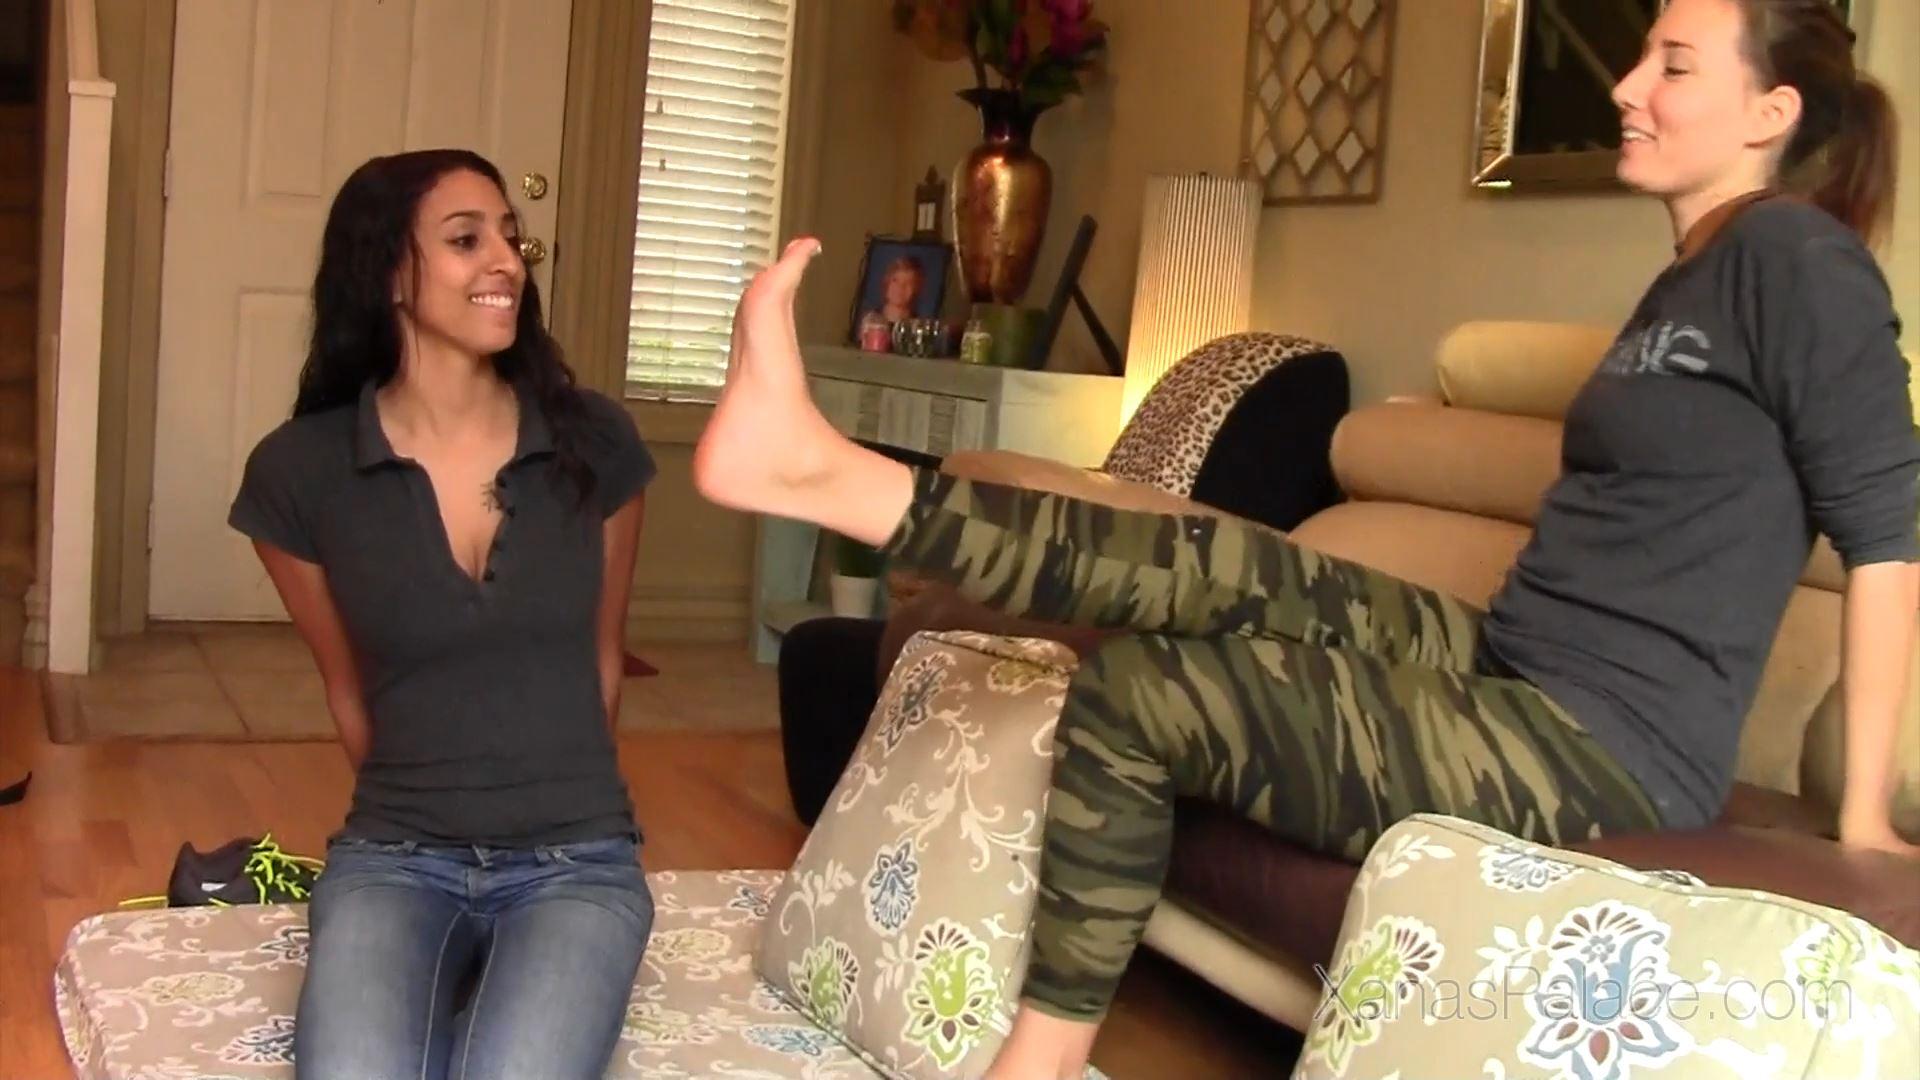 Hazel, Tanya In Scene: Gym Trainers Stinky Feet Punishment - XANASPALACE - FULL HD/1080p/MP4